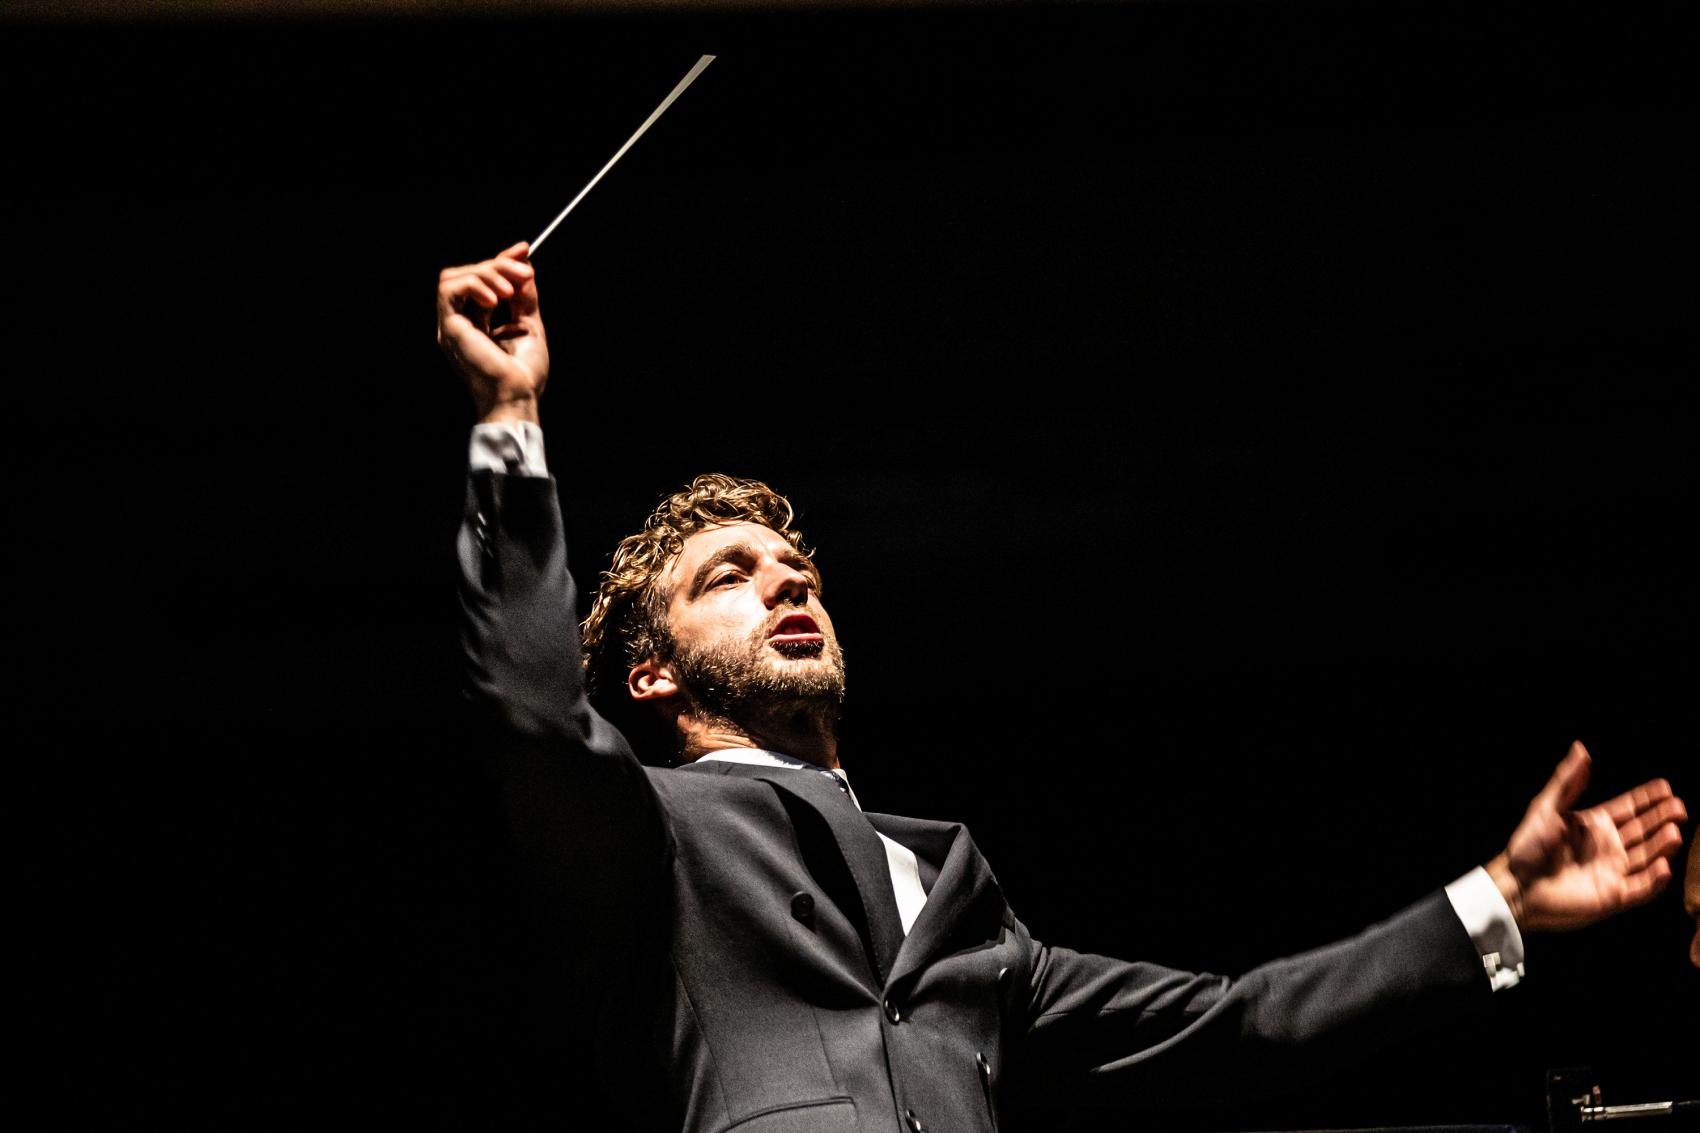 Lorenzo Viotti dirigeert Tsjaikovski en Debussy in online concert